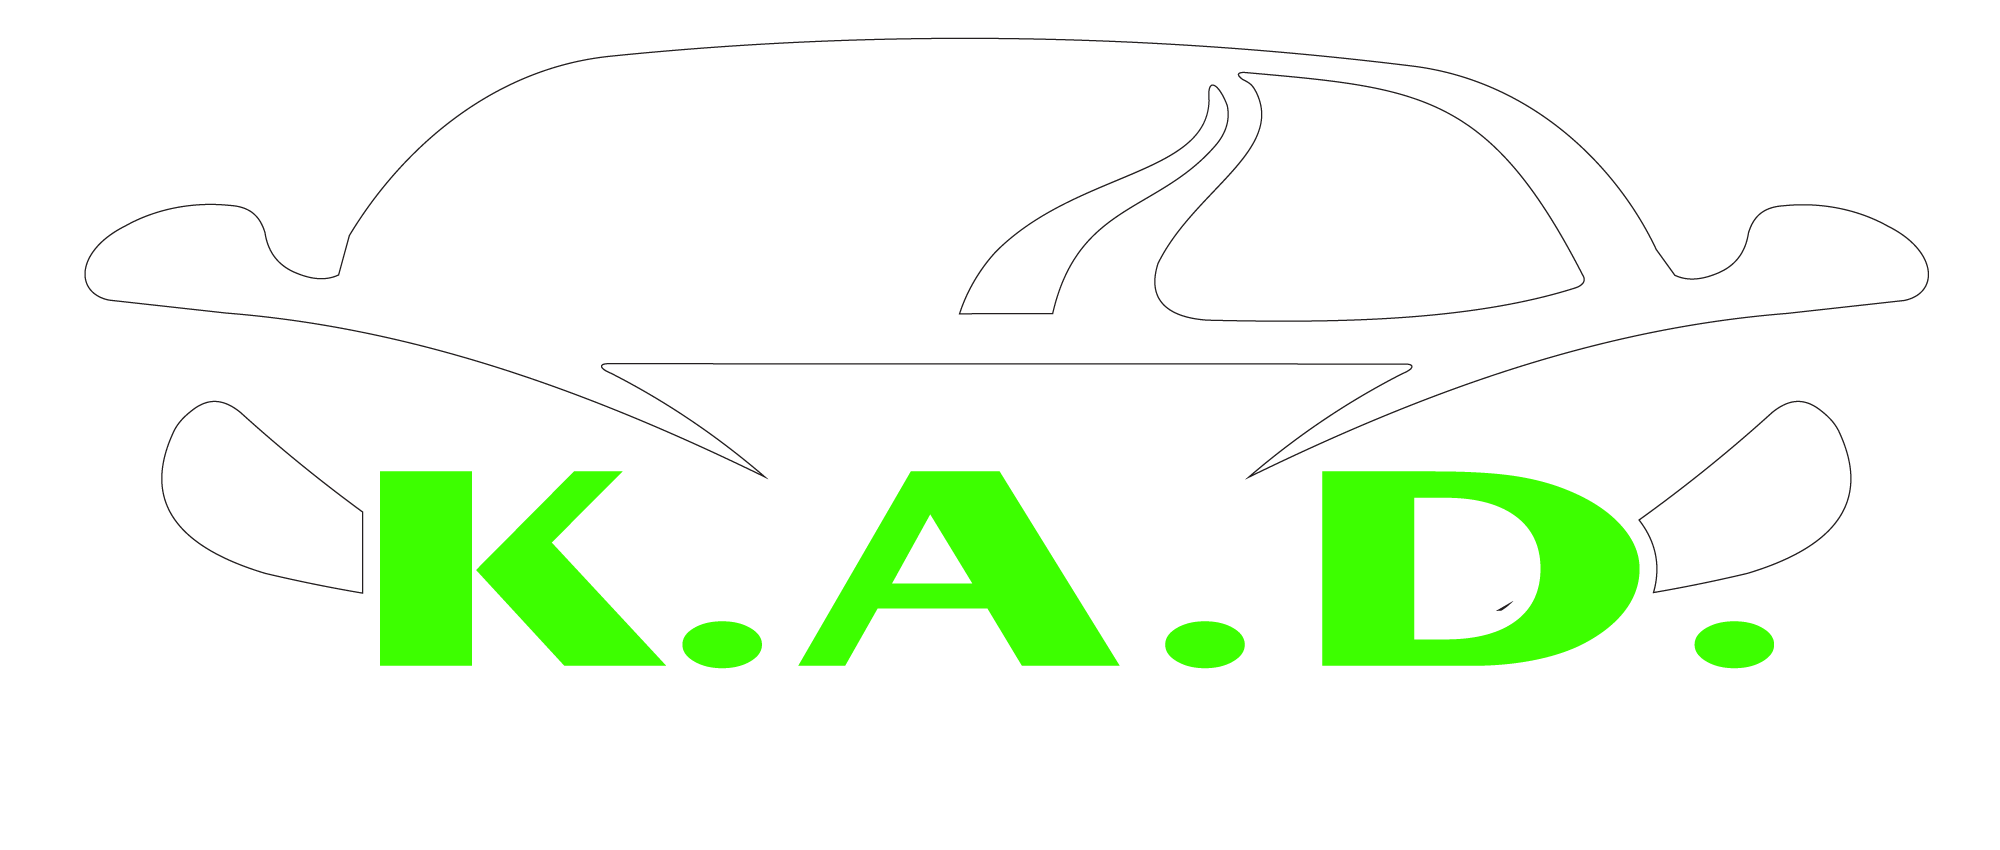 AVTOCENTER KAD